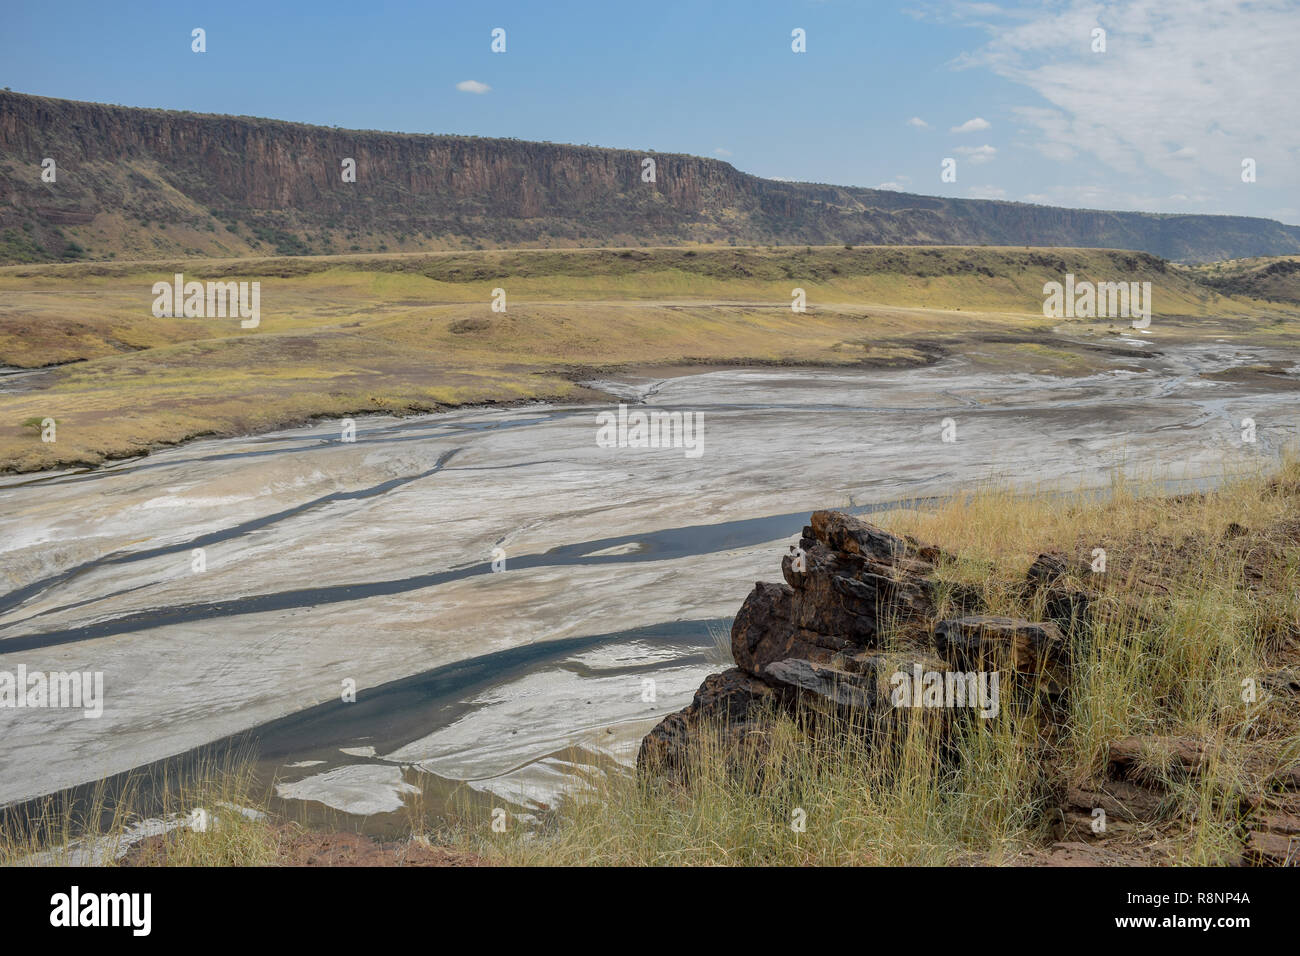 The arid landscapes of Lake Magadi, Rift Valley, Kenya Stock Photo